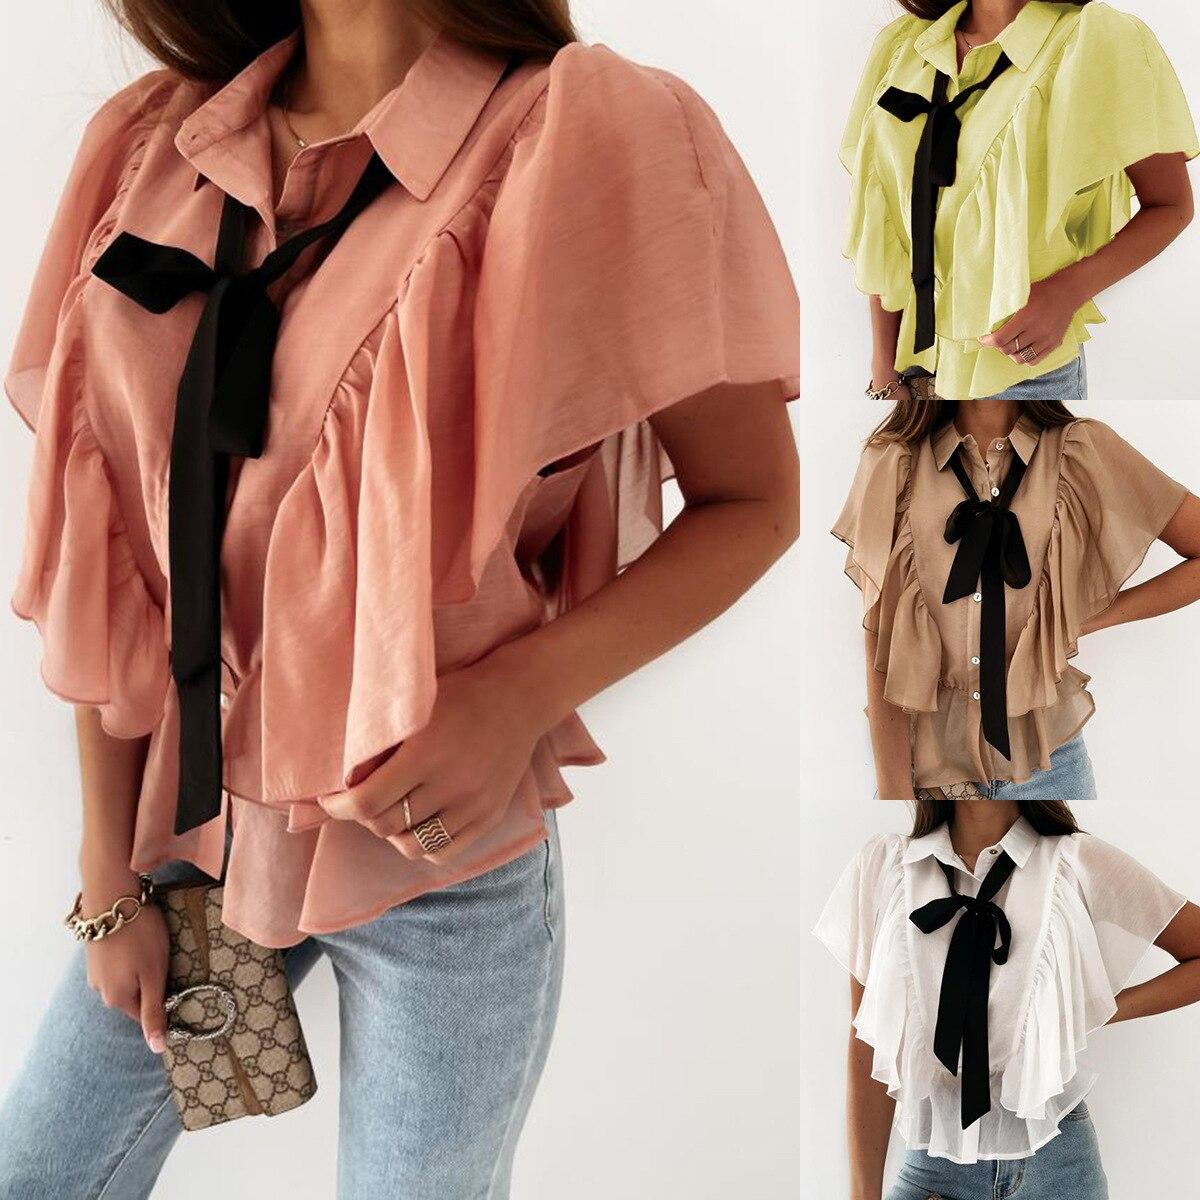 flare sleeve bow tie back blouse Summer New 2021 Women Fashion Ruffles Short Sleeve Lapel Chiffon Shirts Ladies Casual Bow-Tie Blouse Shirts Tops Streetwear